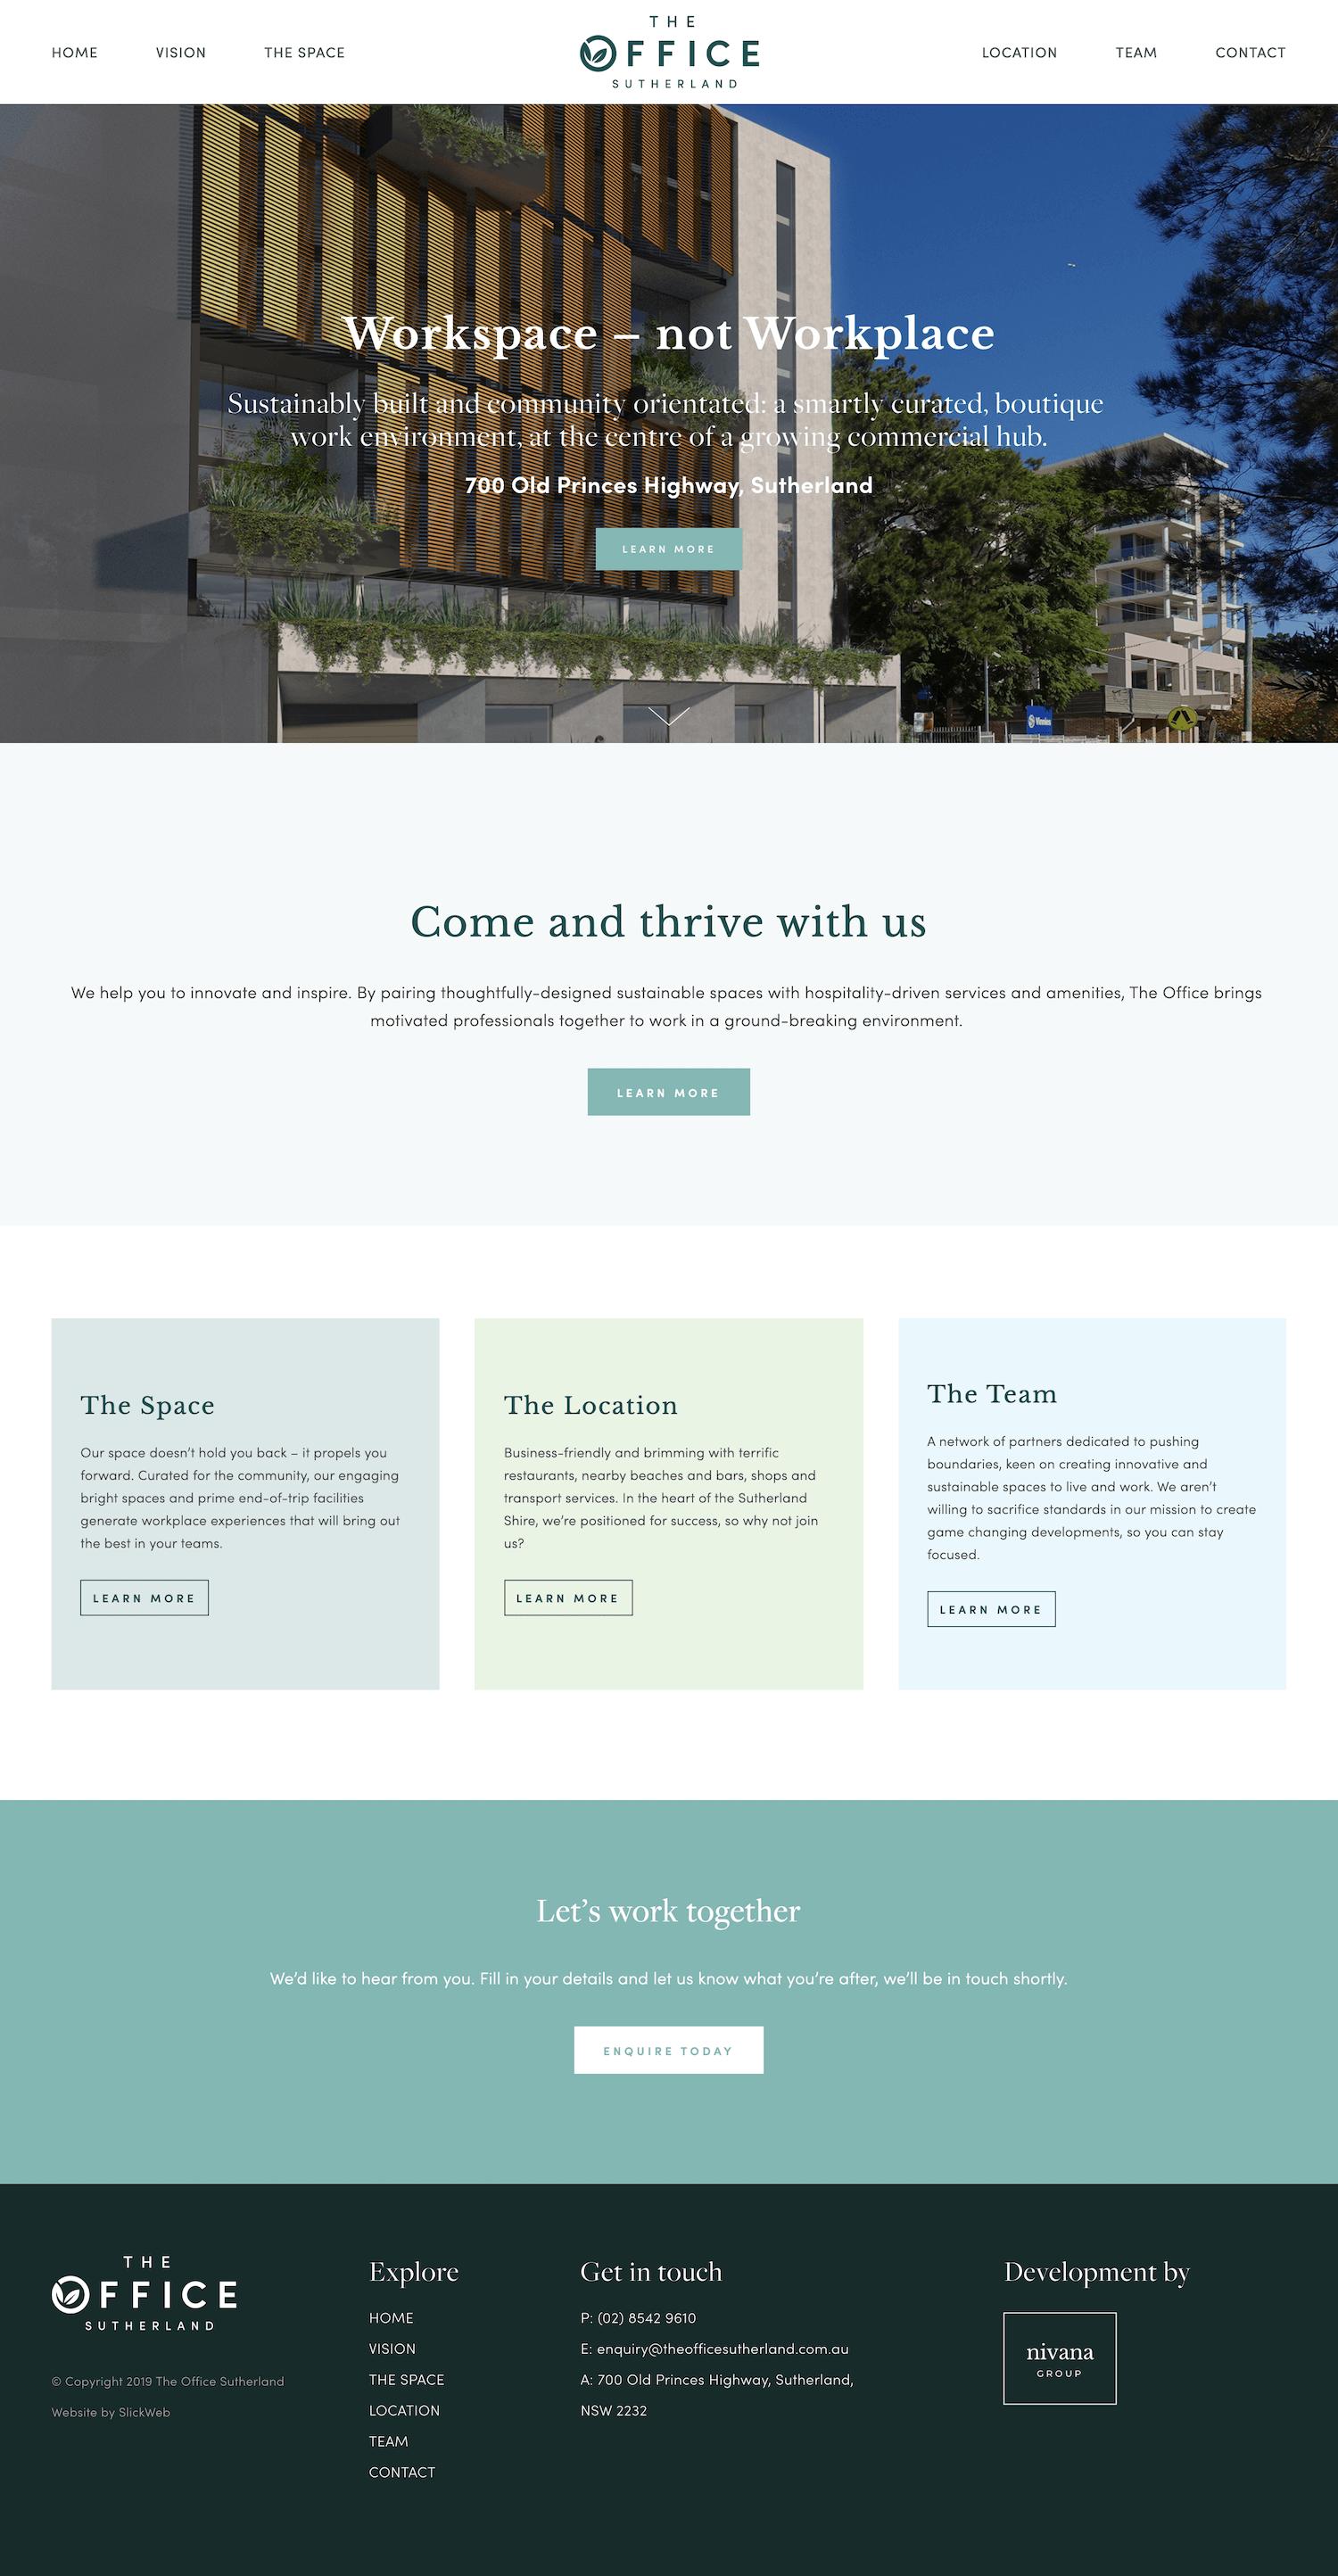 SlickWeb_Work_The_Office_Sutherland_Home_Desktop.png